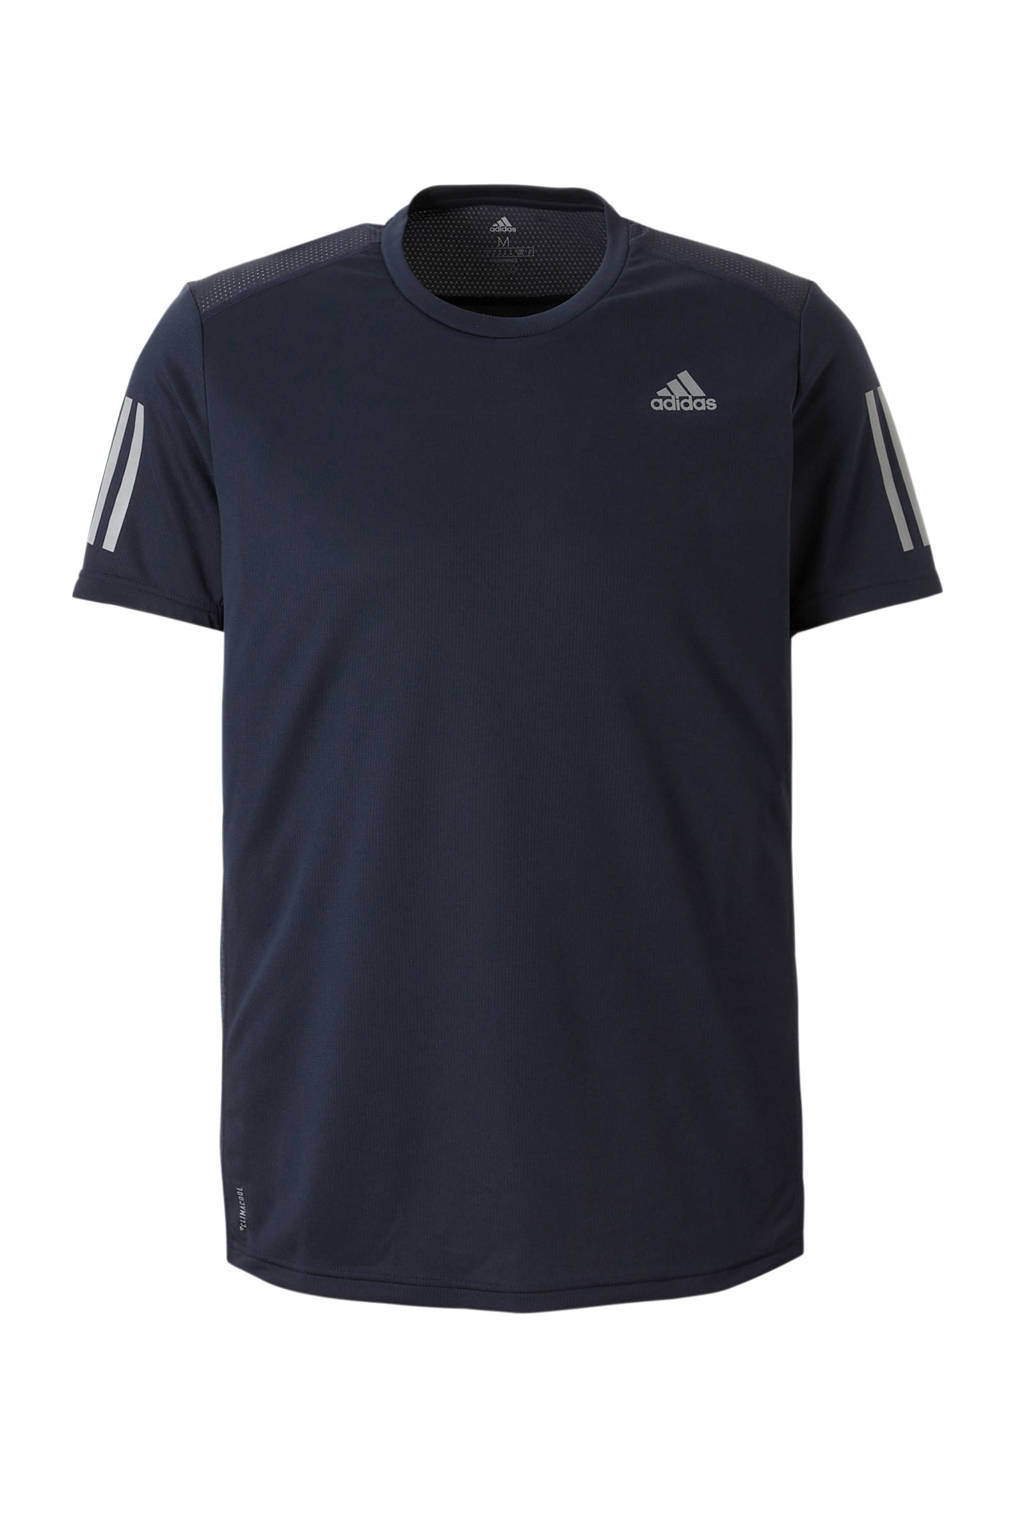 adidas performance   hardloop T-shirt donkerblauw, Donkerblauw